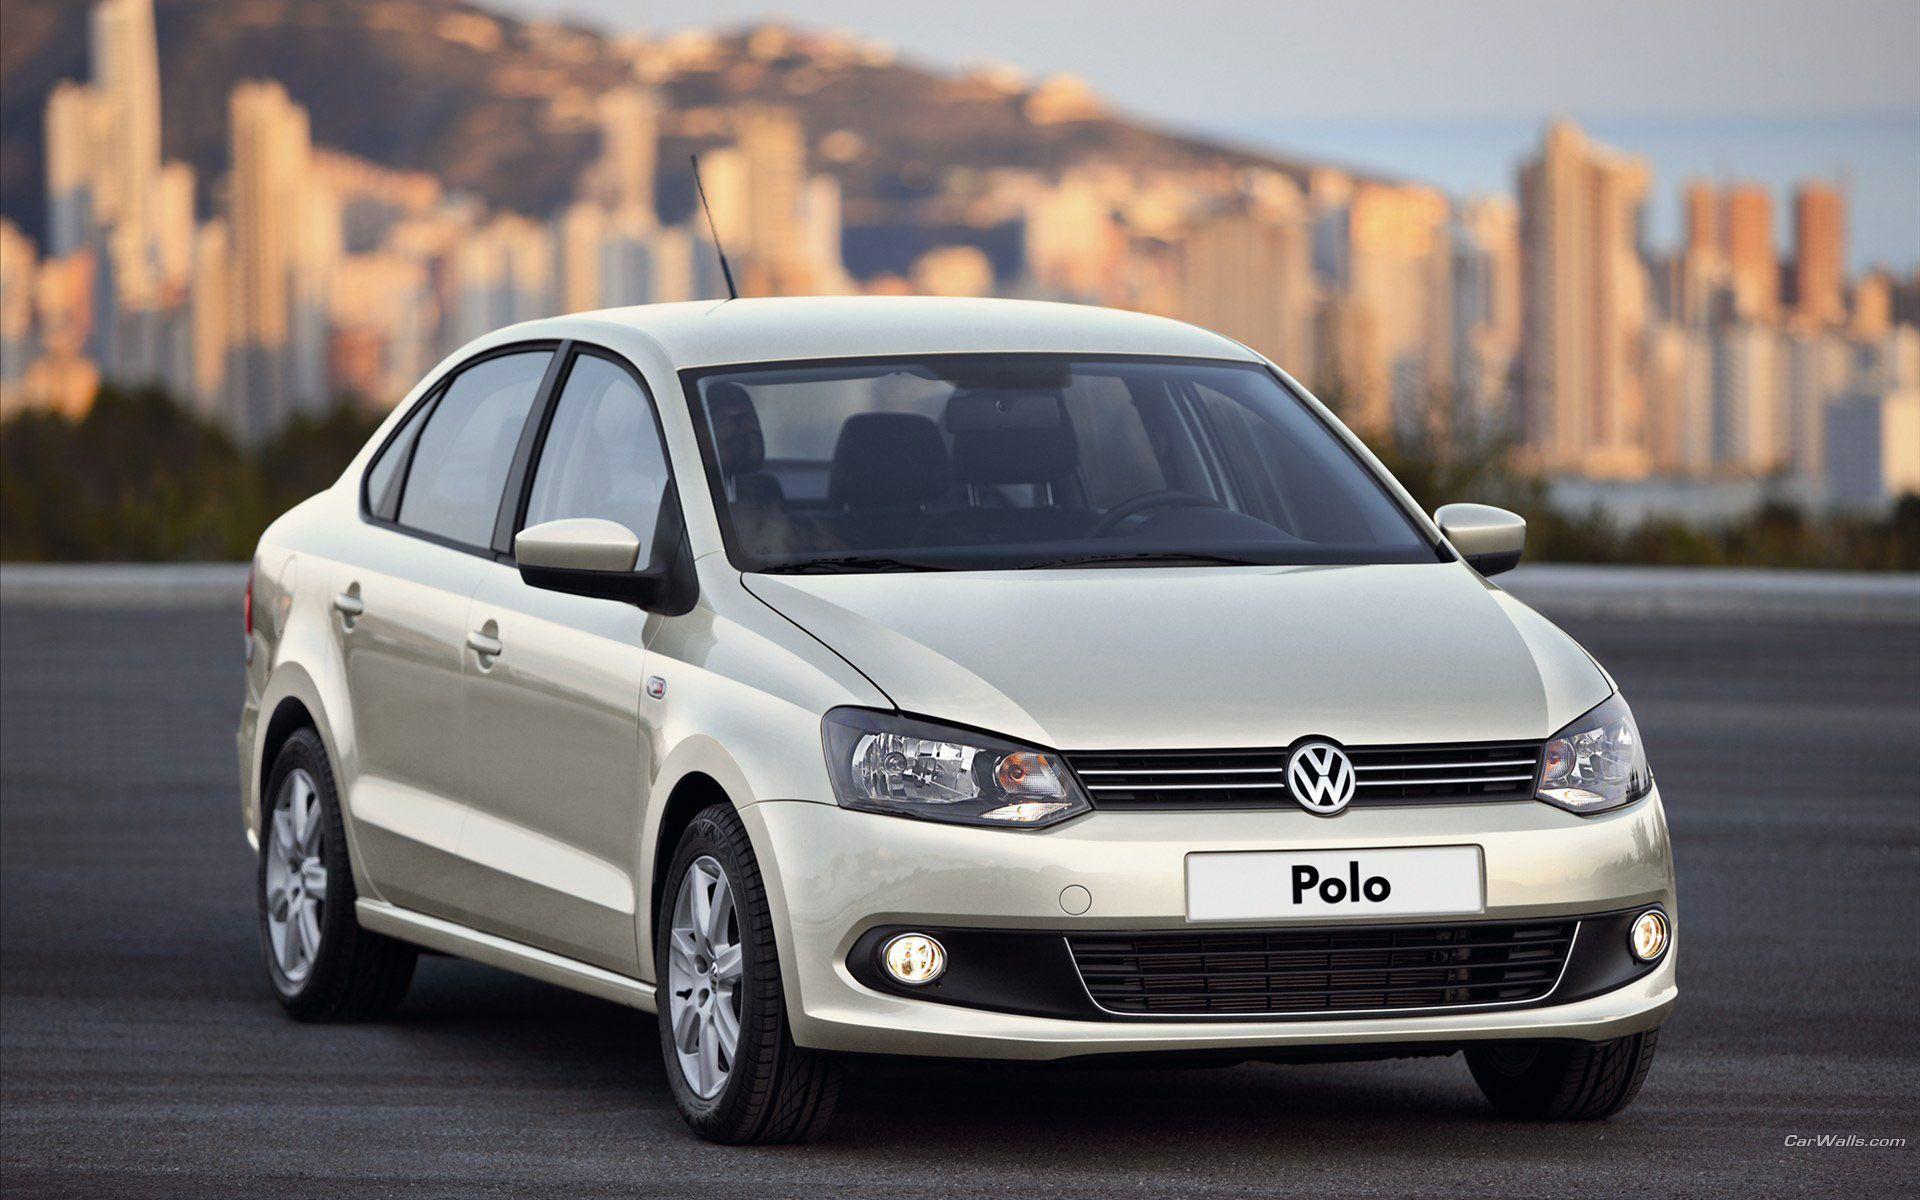 Ultra HD VW polo saloon 658 1920�1200